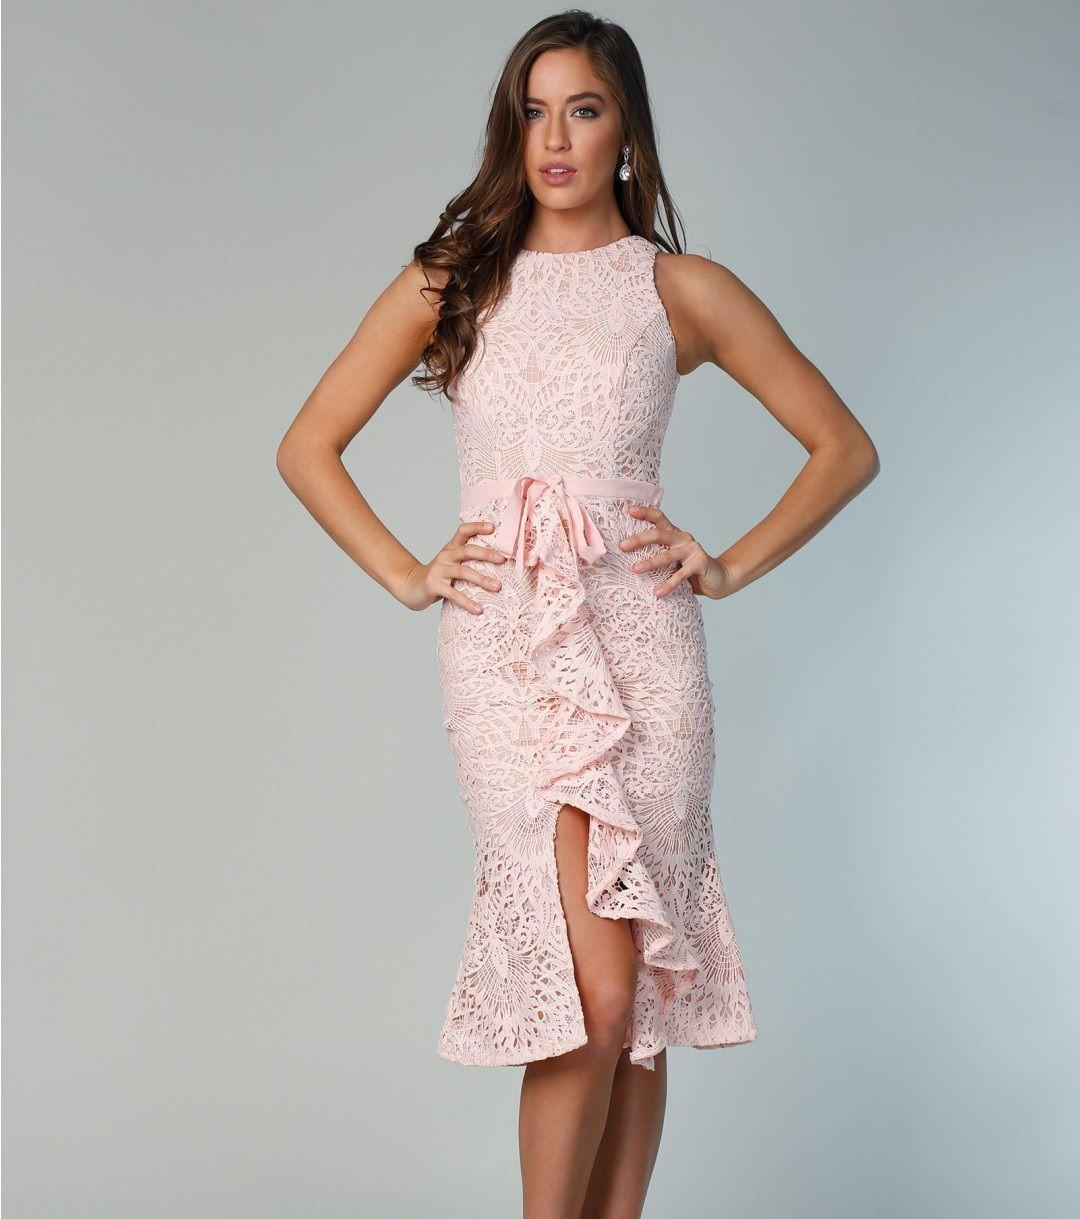 Sukienka Jarlo Dyani Sukienka Na Wesele Sukienka Koronkowa Sukienka Midi Sukienka Dla Druhny Dress Coctail Dress Midi D Fashion Dresses Fashion Boutique